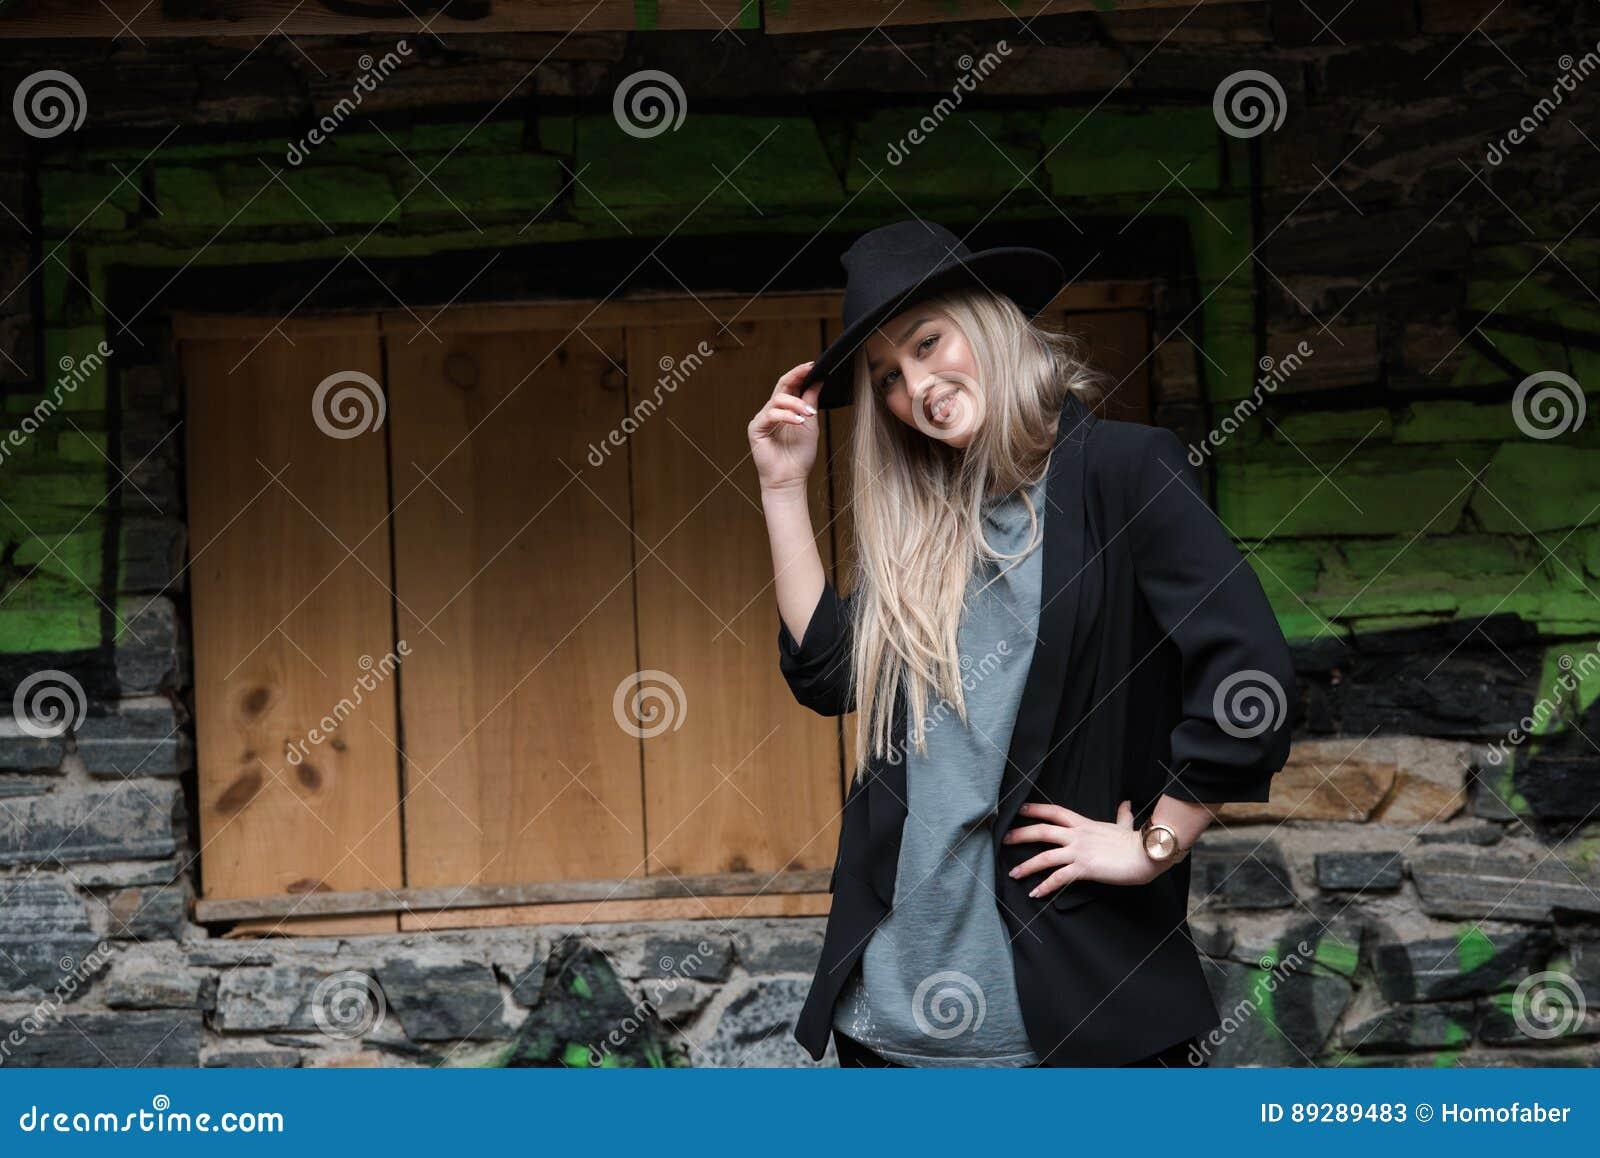 Cute blond teen wear black jacket and hat